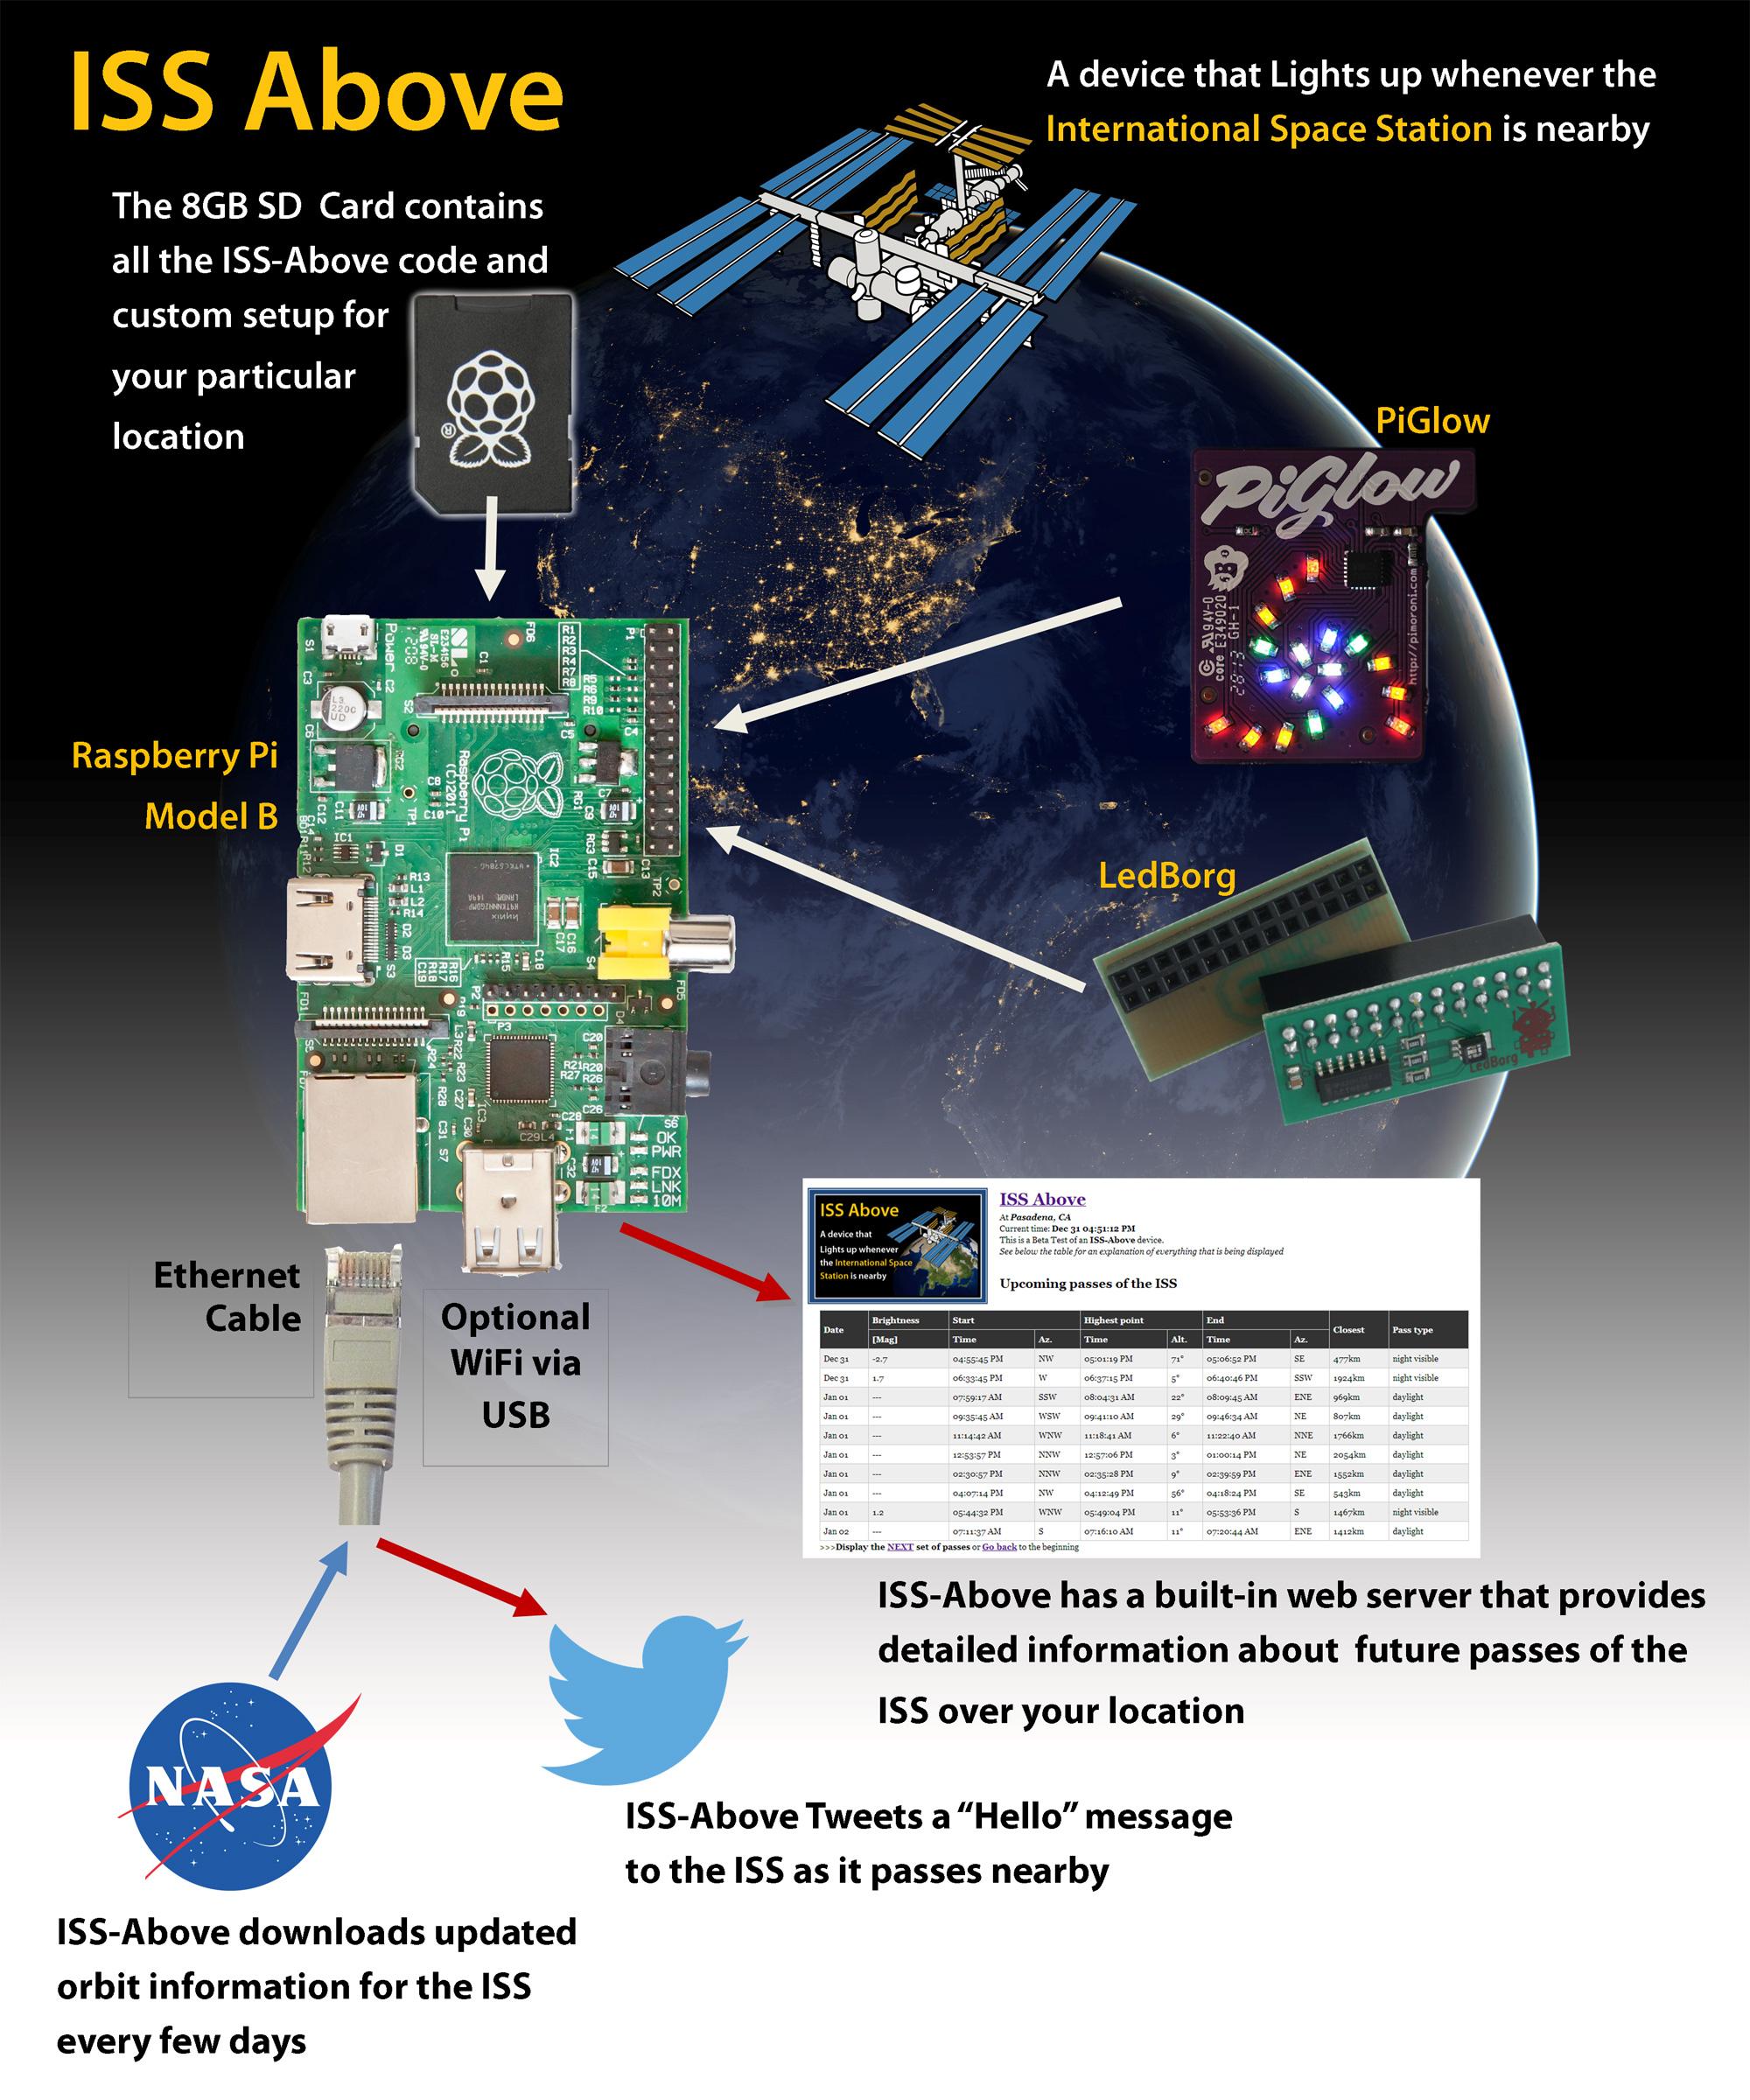 Esquema del ISS Above, hazlo ya mismo!